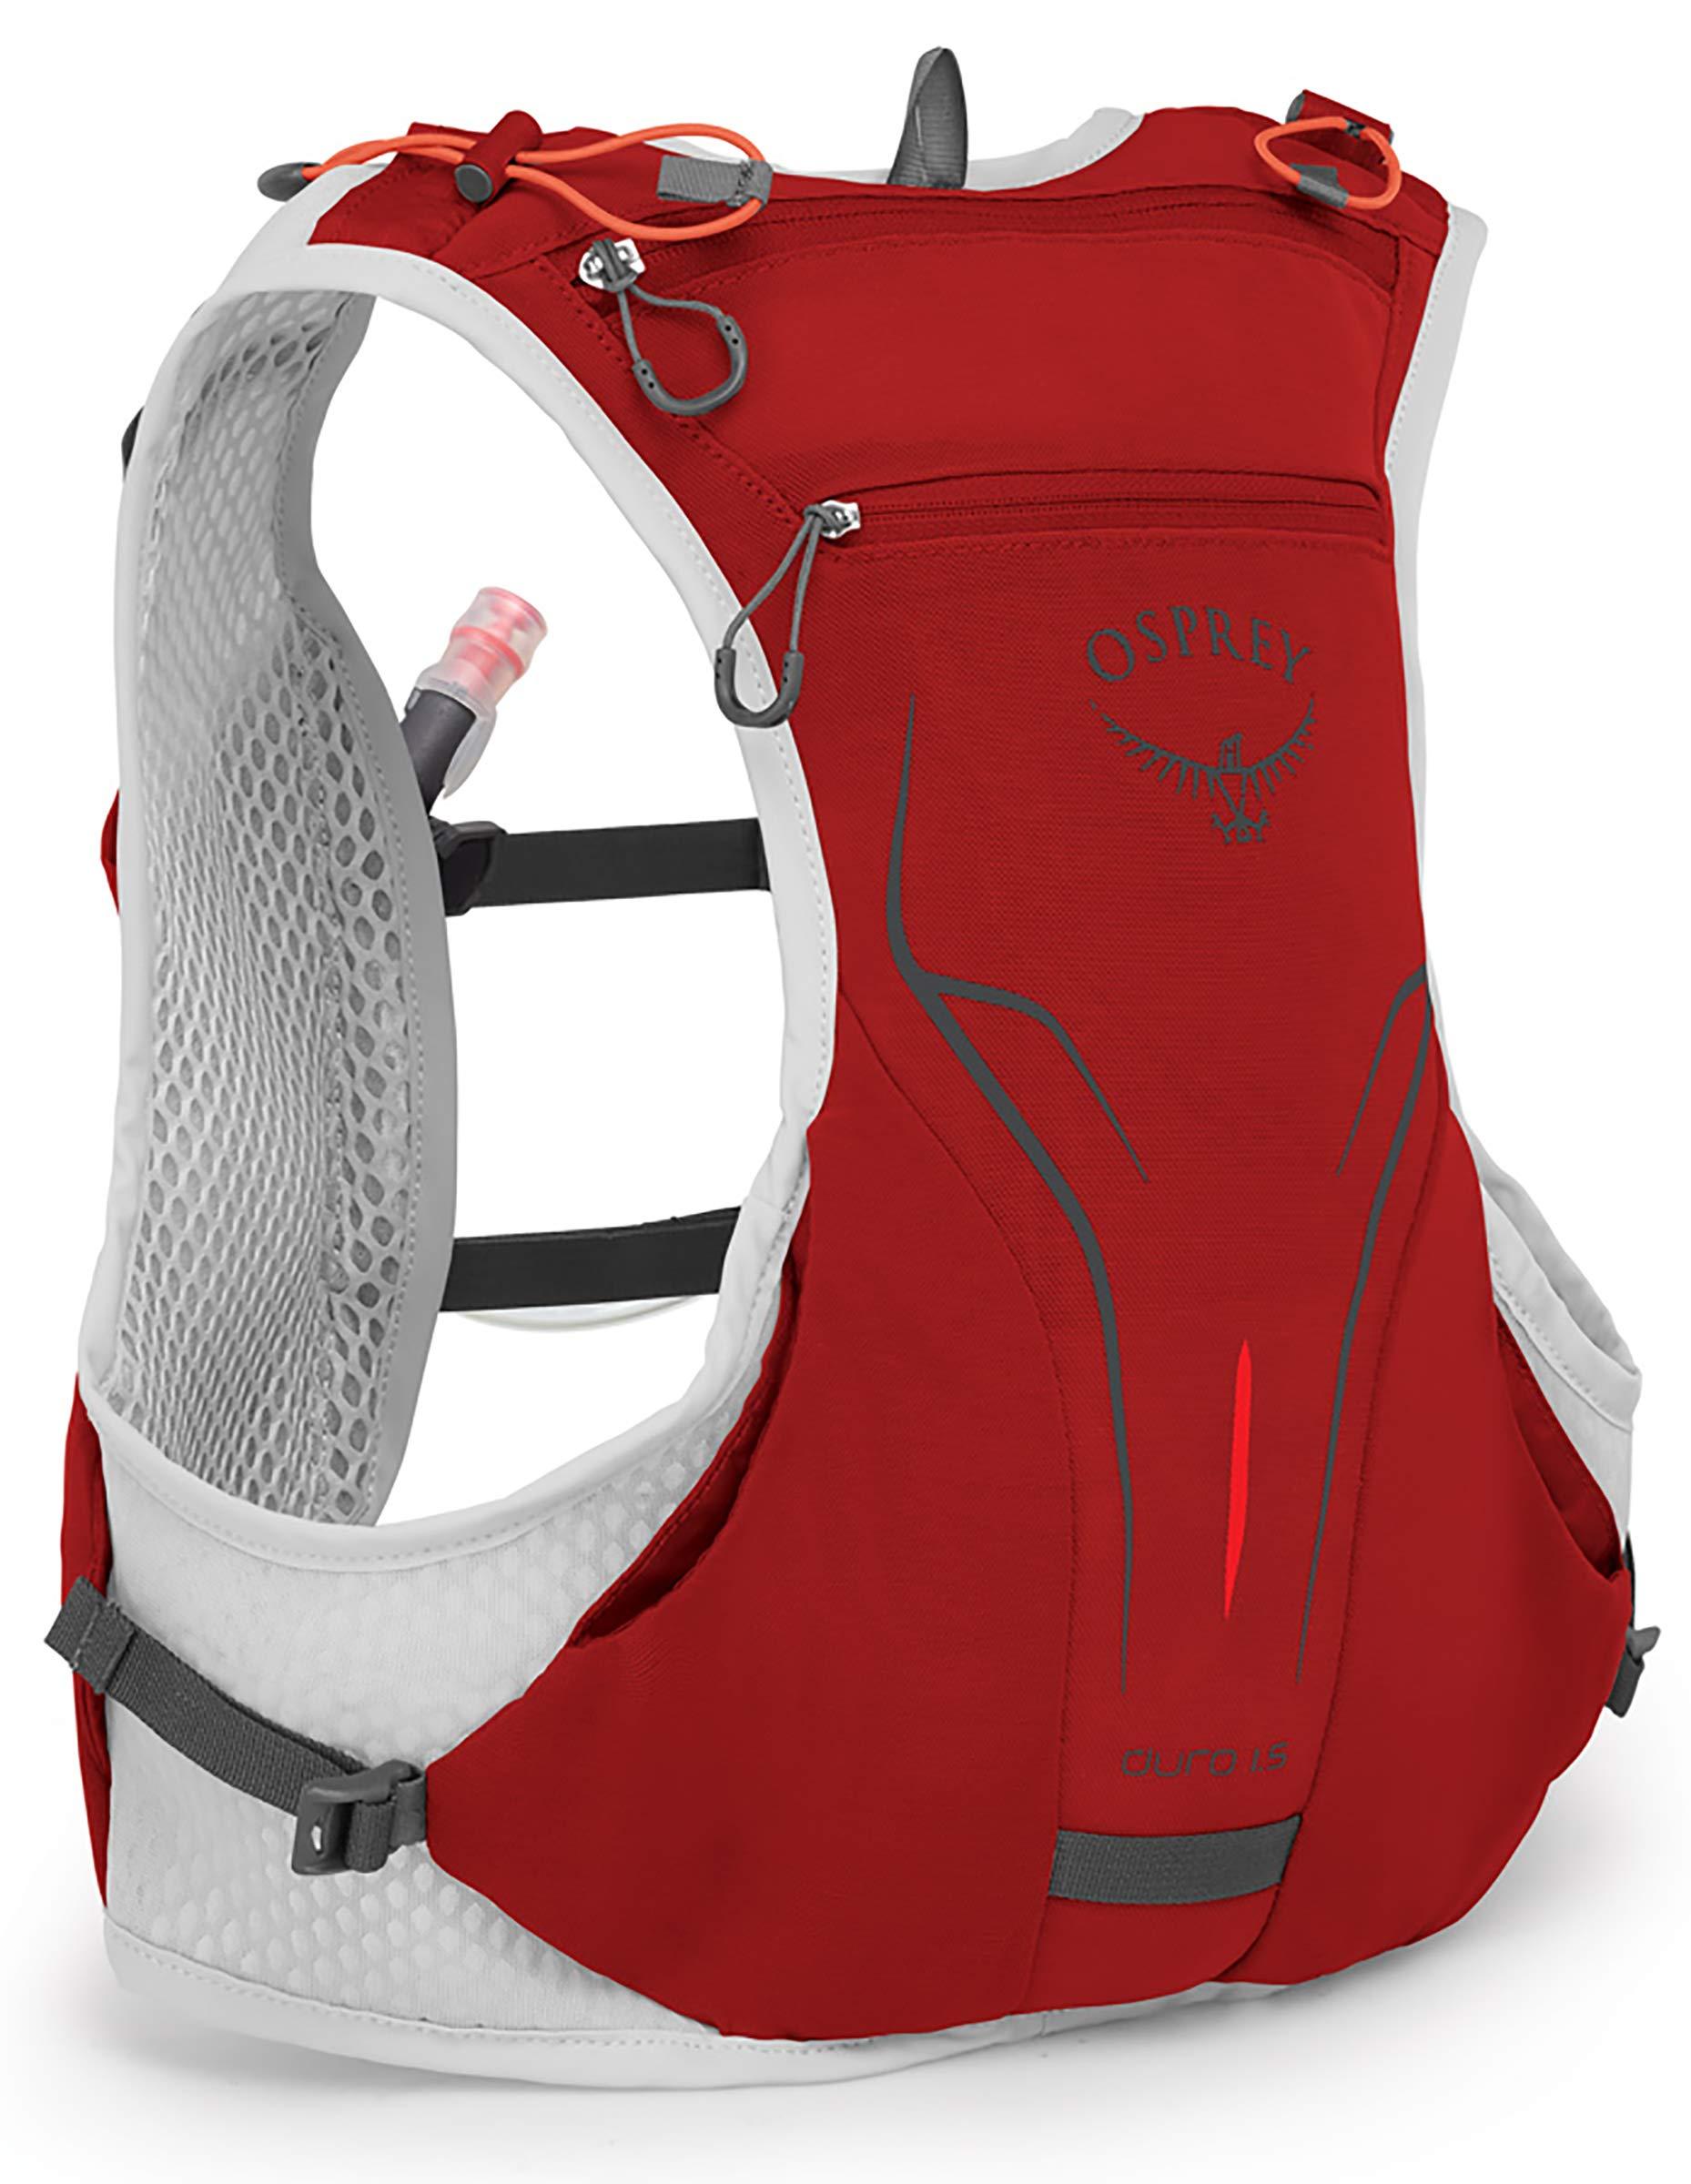 Osprey Packs Duro 1.5L Running Hydration Vest, Phoenix Red, Medium/Large